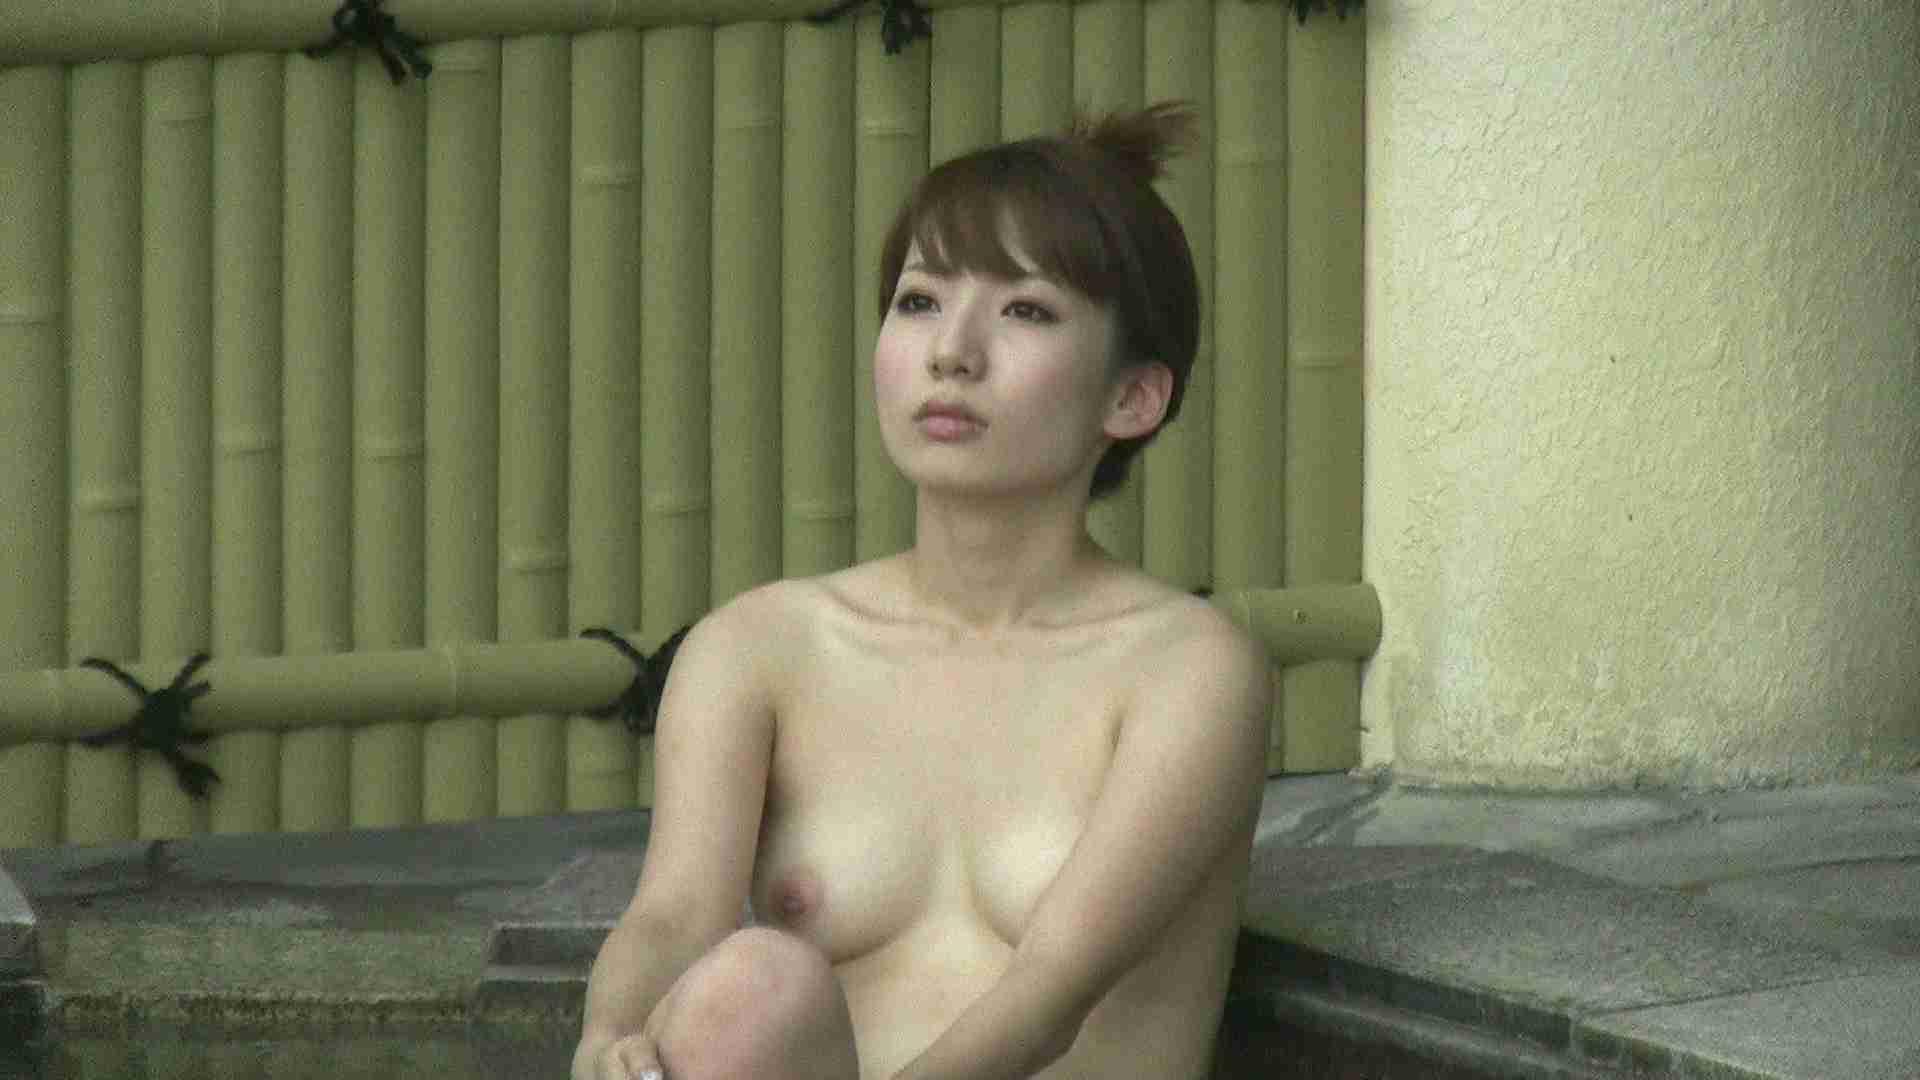 Aquaな露天風呂Vol.208 露天風呂編  103PIX 14